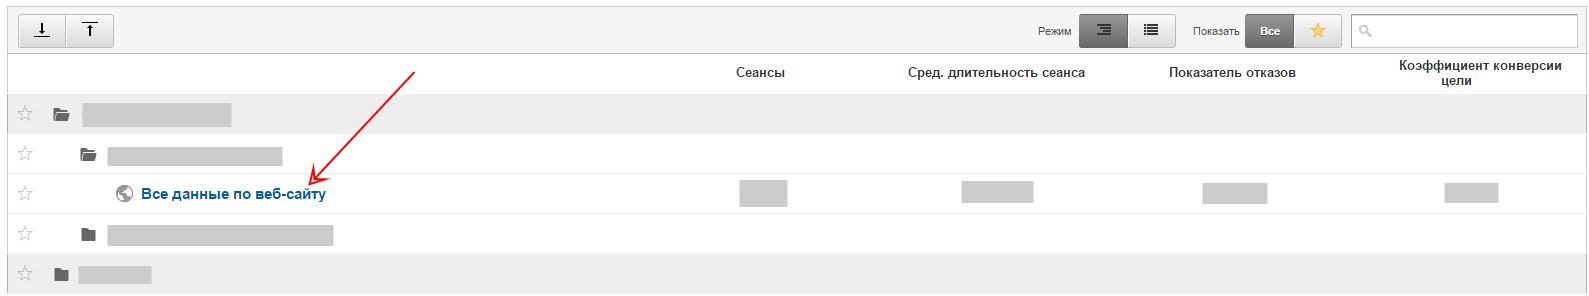 Гугл_Аналитикс